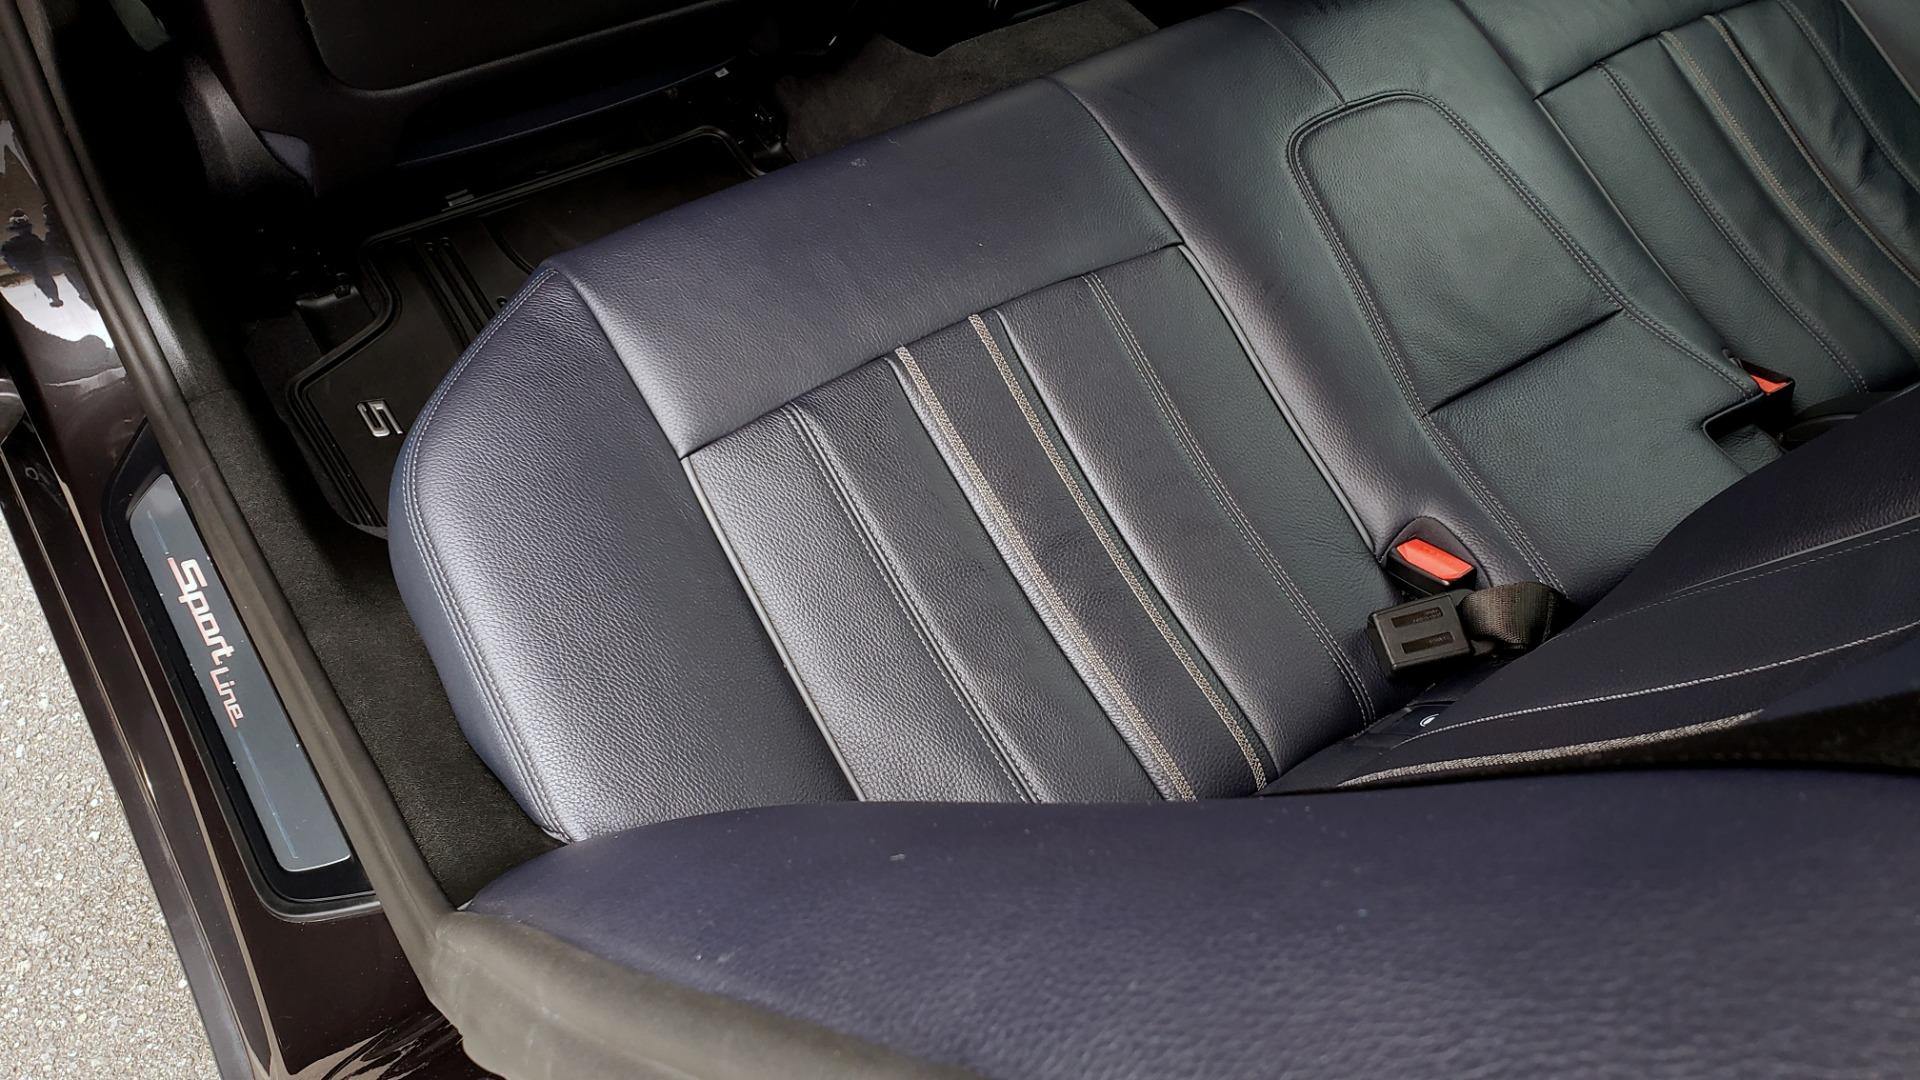 Used 2017 BMW 5 SERIES 530IXDRIVE / PREM PKG / DRVR ASST PLUS / CLD WTHR / APPLE CARPLAY for sale $30,595 at Formula Imports in Charlotte NC 28227 61